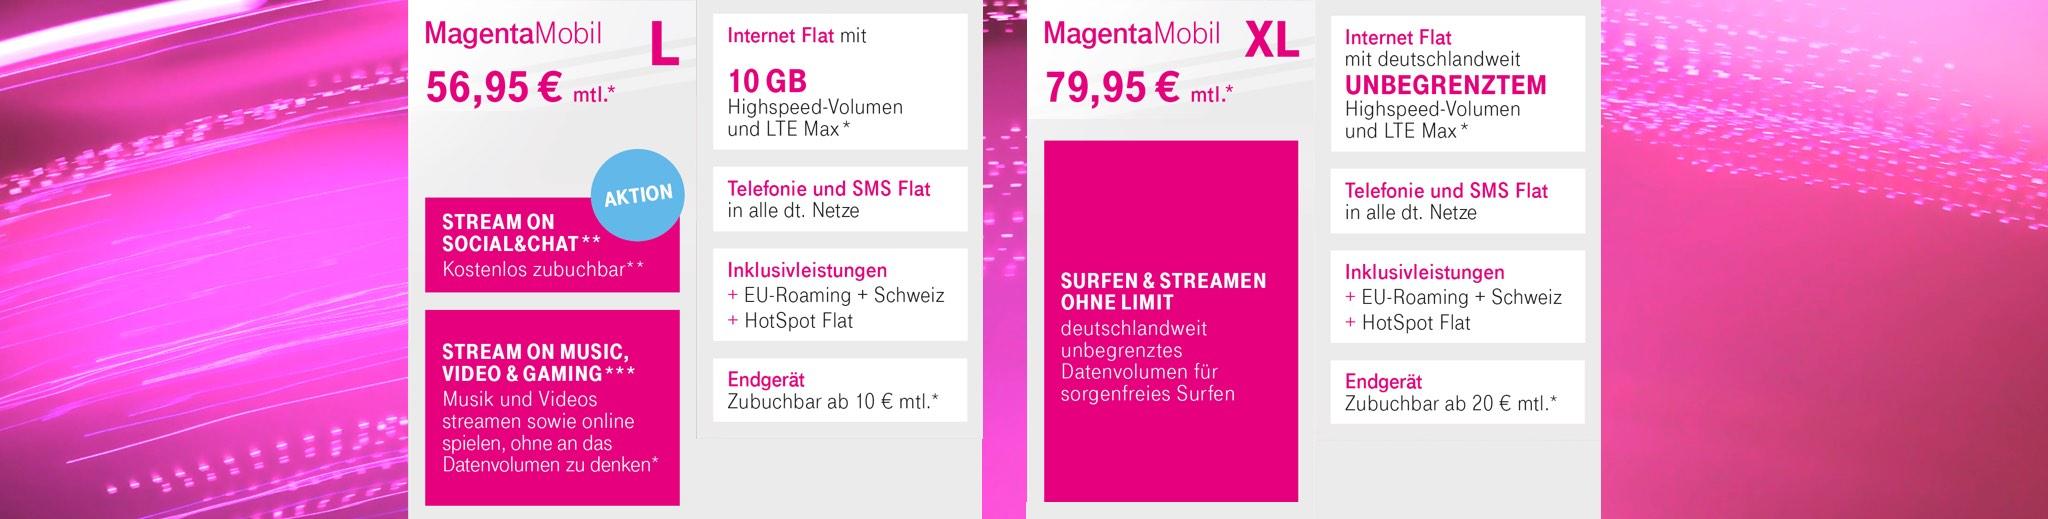 Telekom Magenta Tarife L und XL